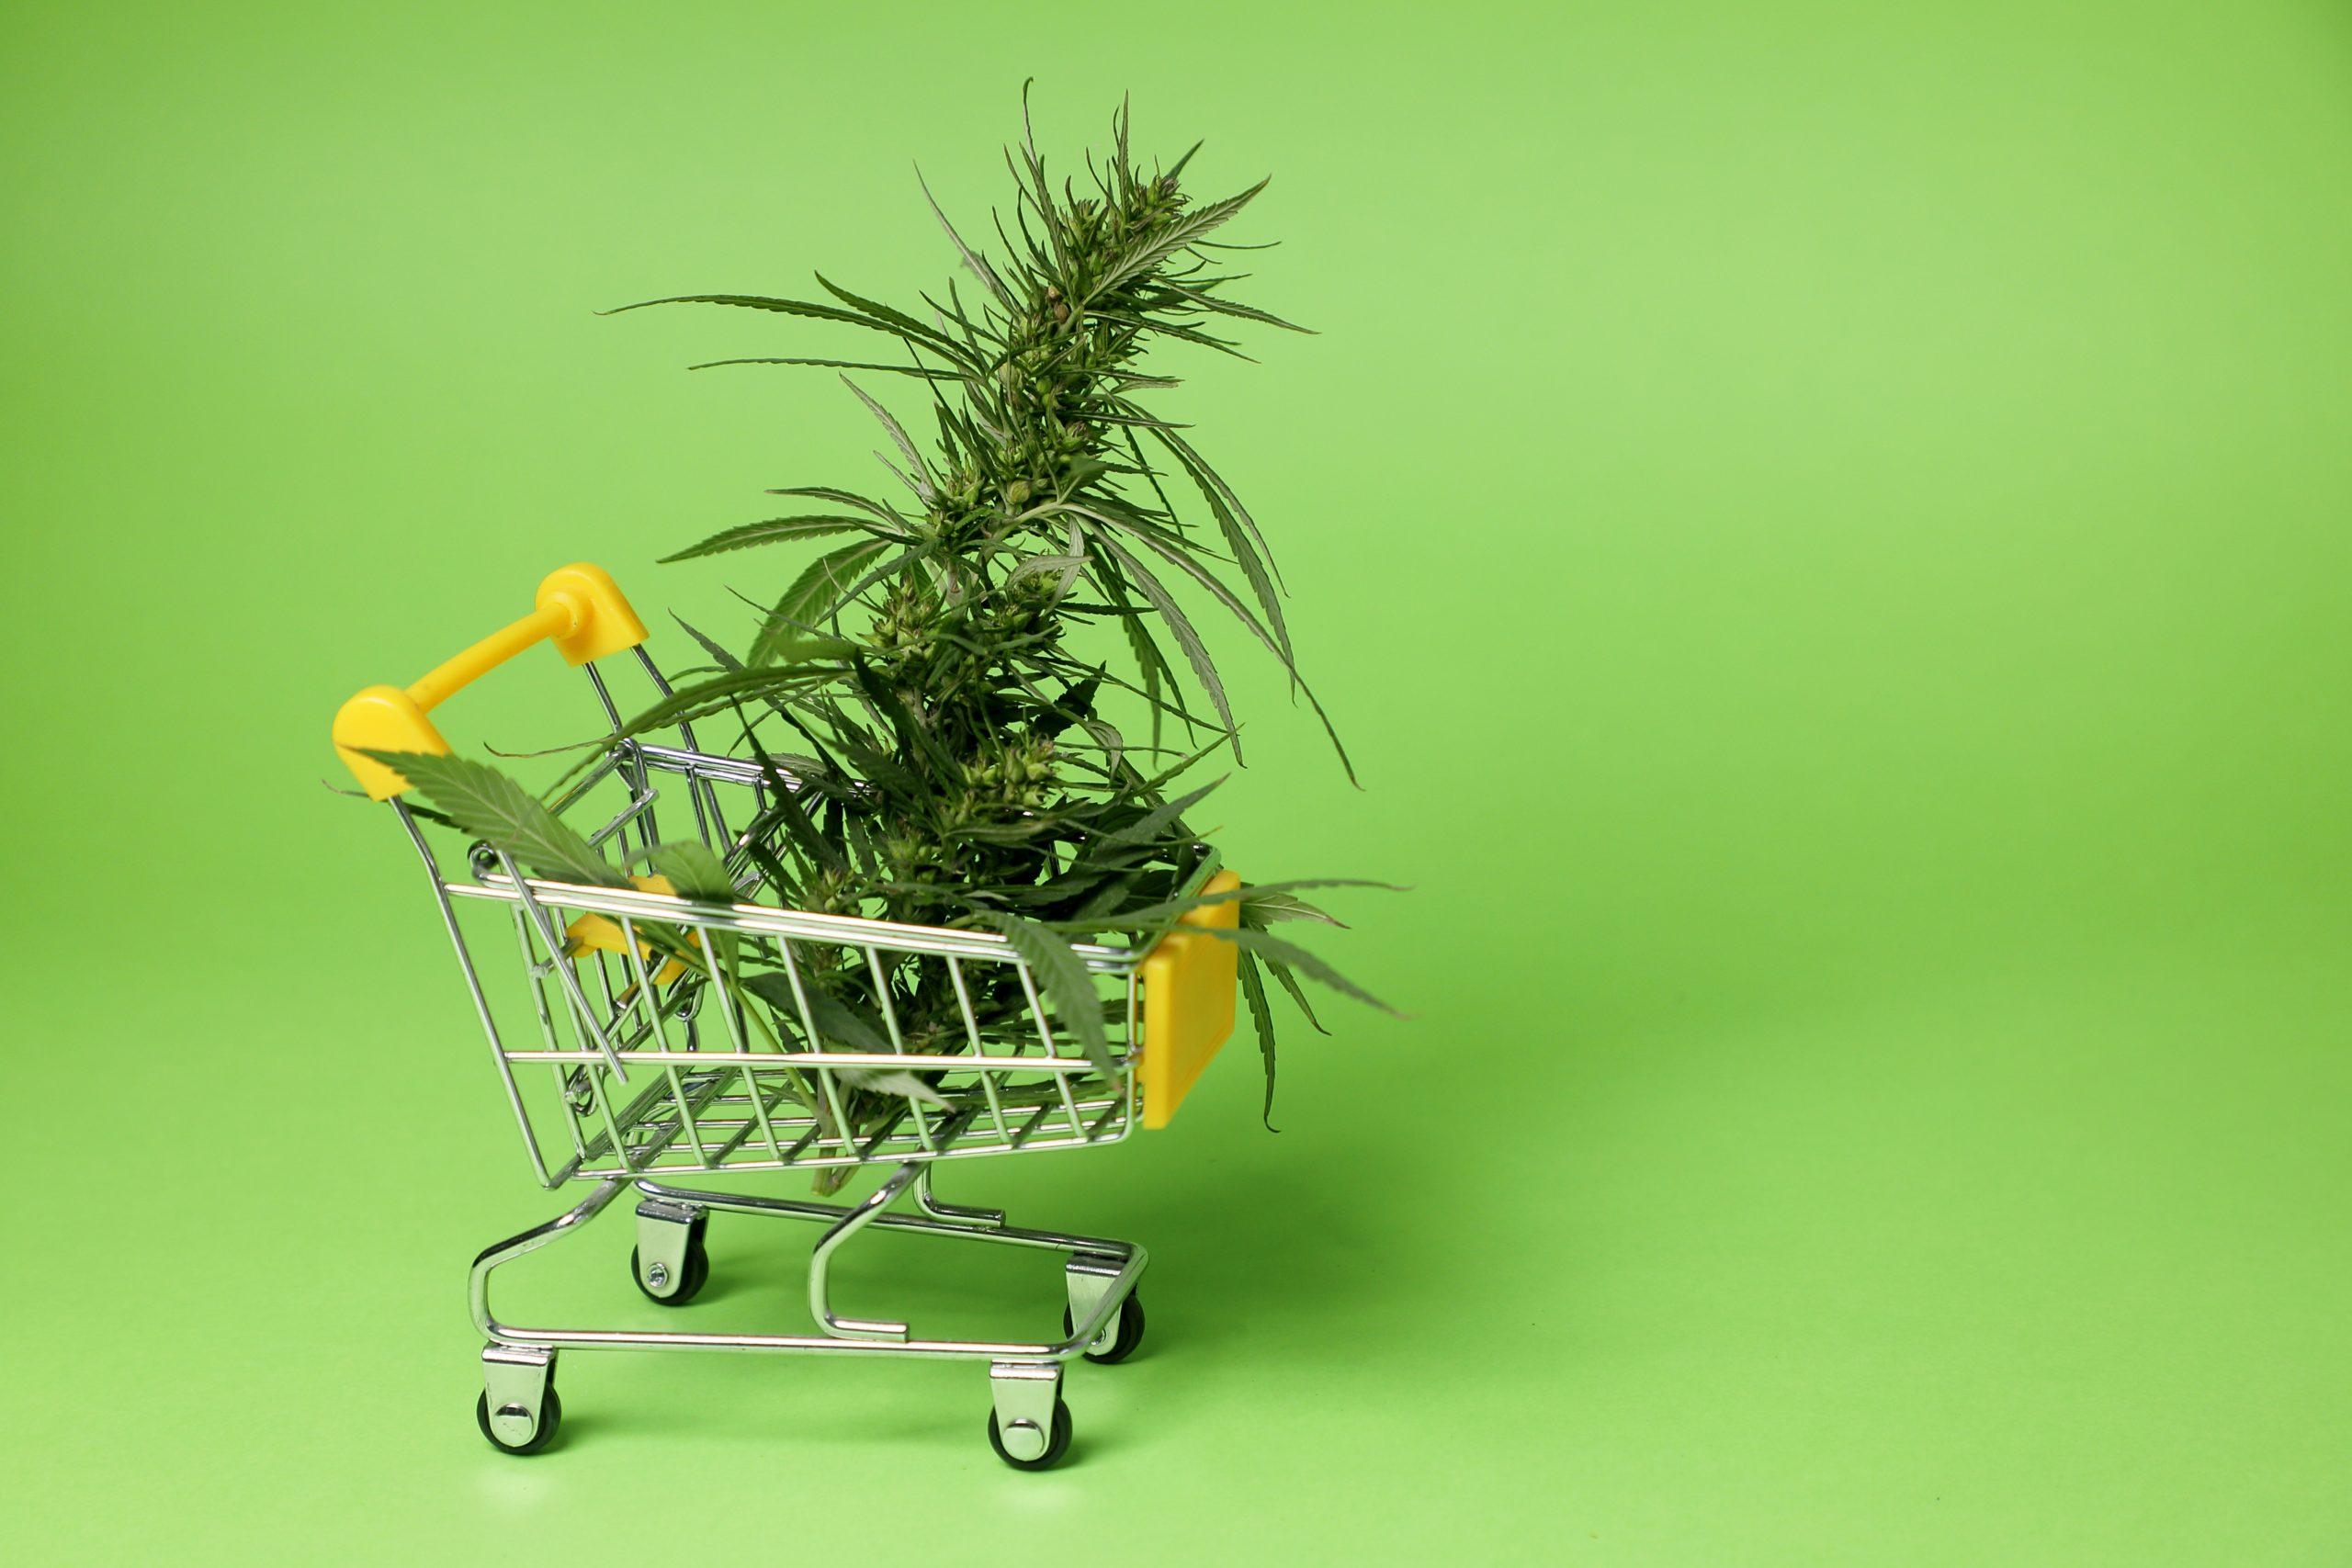 Mercado da cannabis no Brasil: terreno fértil para boas ideias